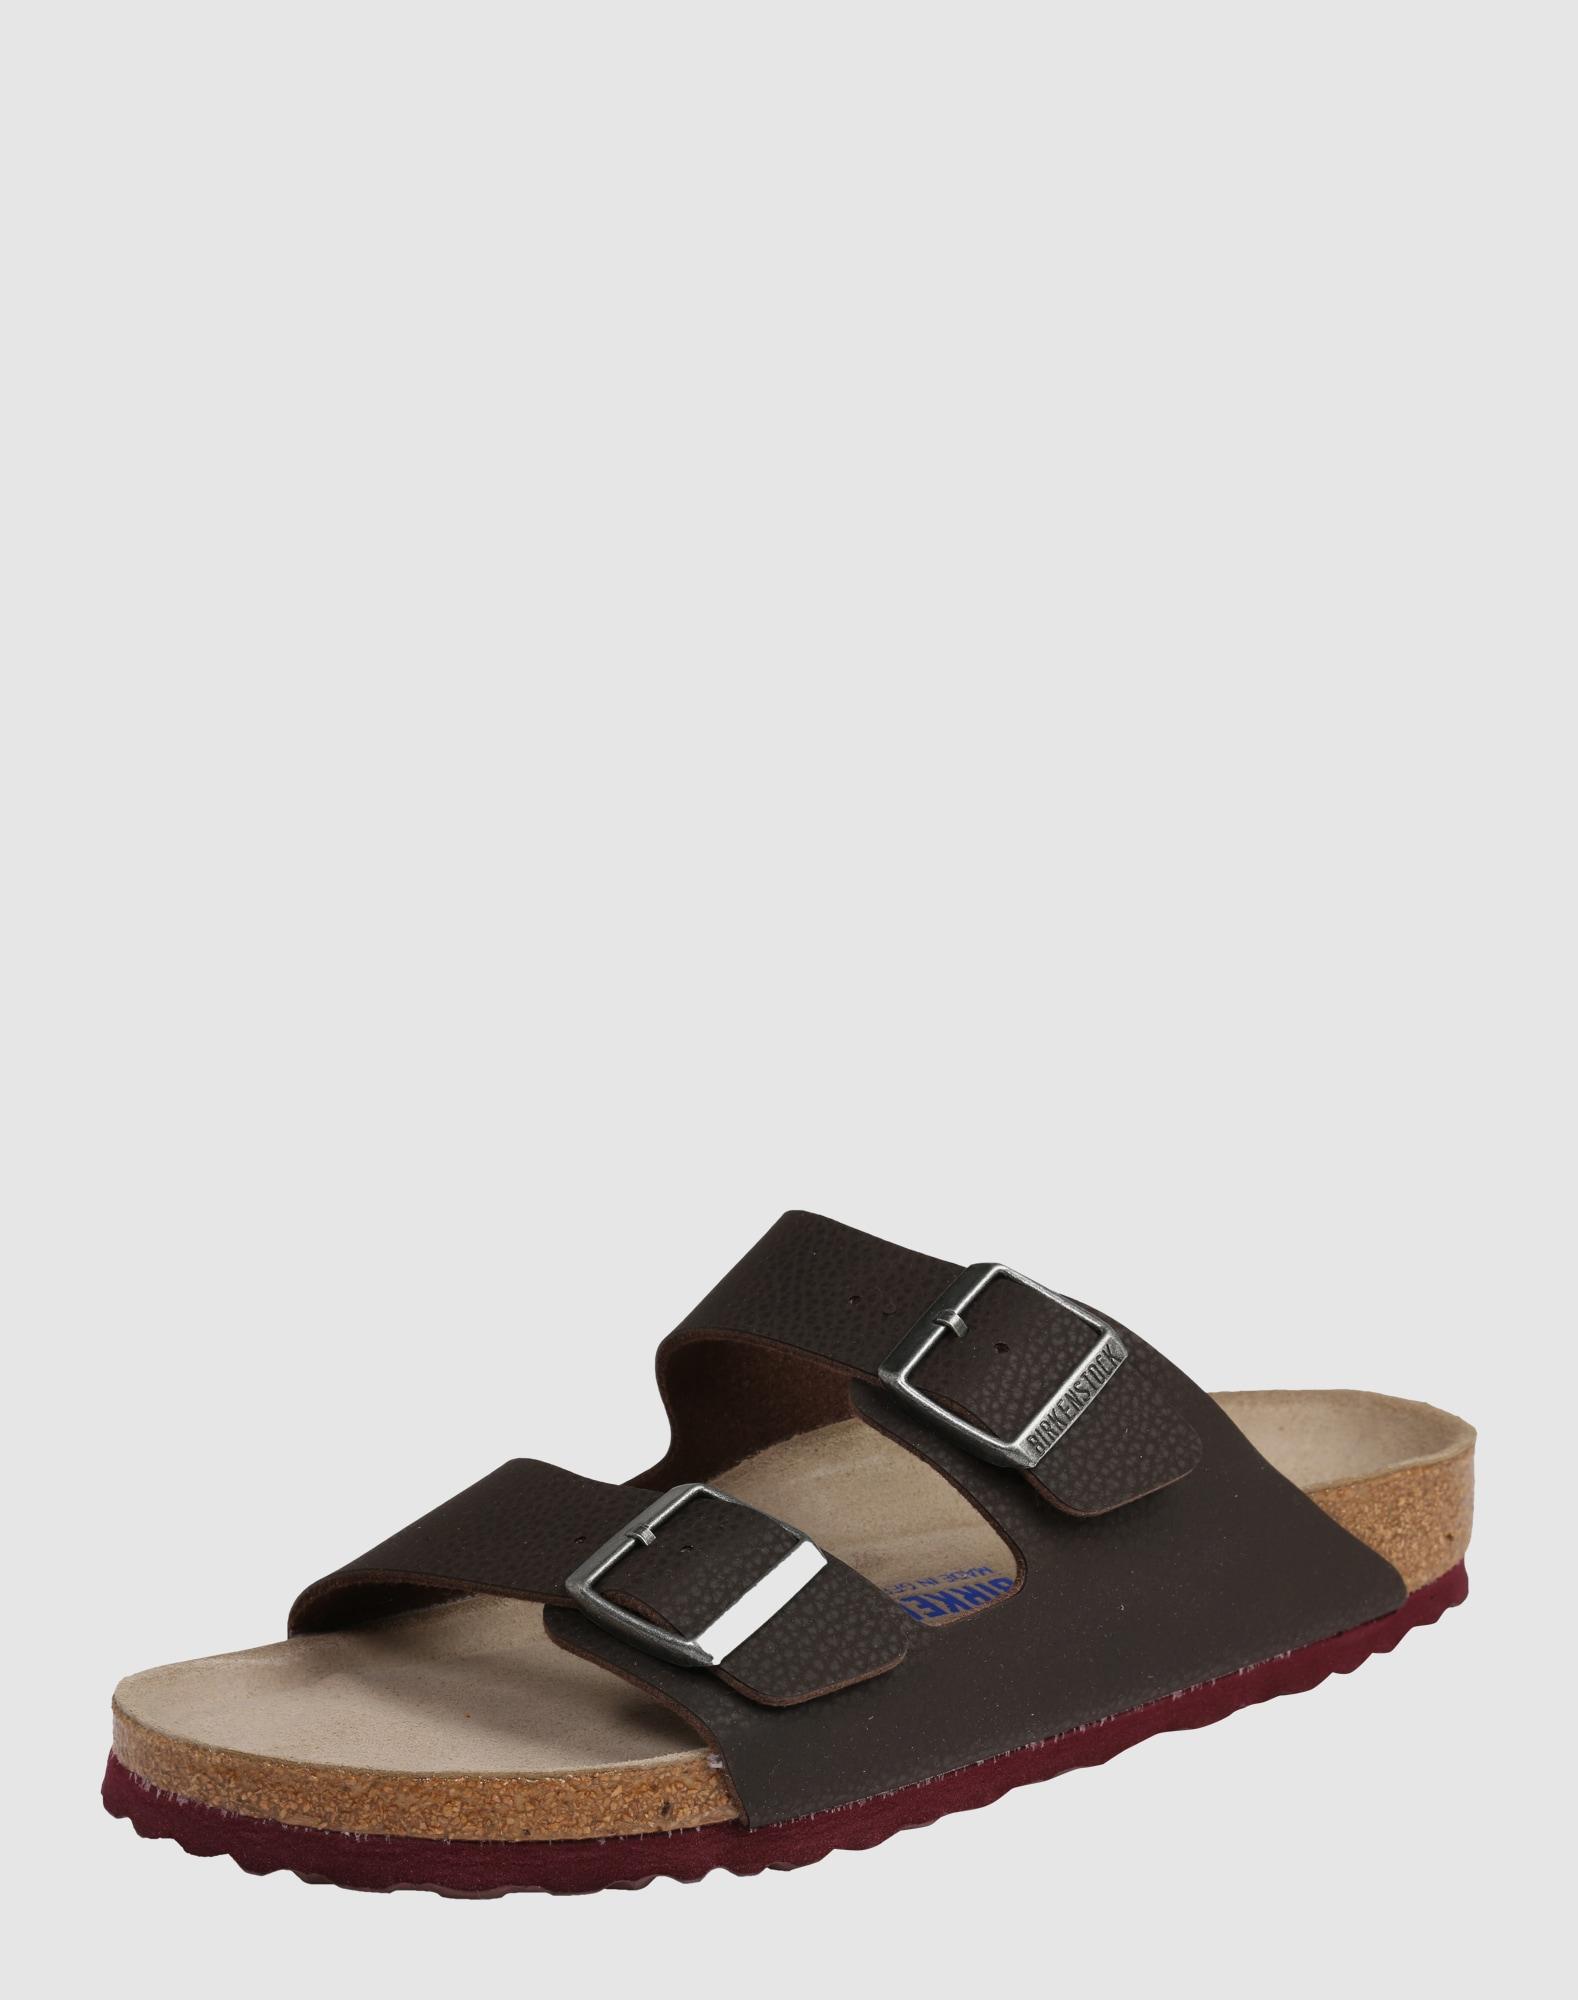 birkenstock sandale 39 arizona 39 in braun about you. Black Bedroom Furniture Sets. Home Design Ideas